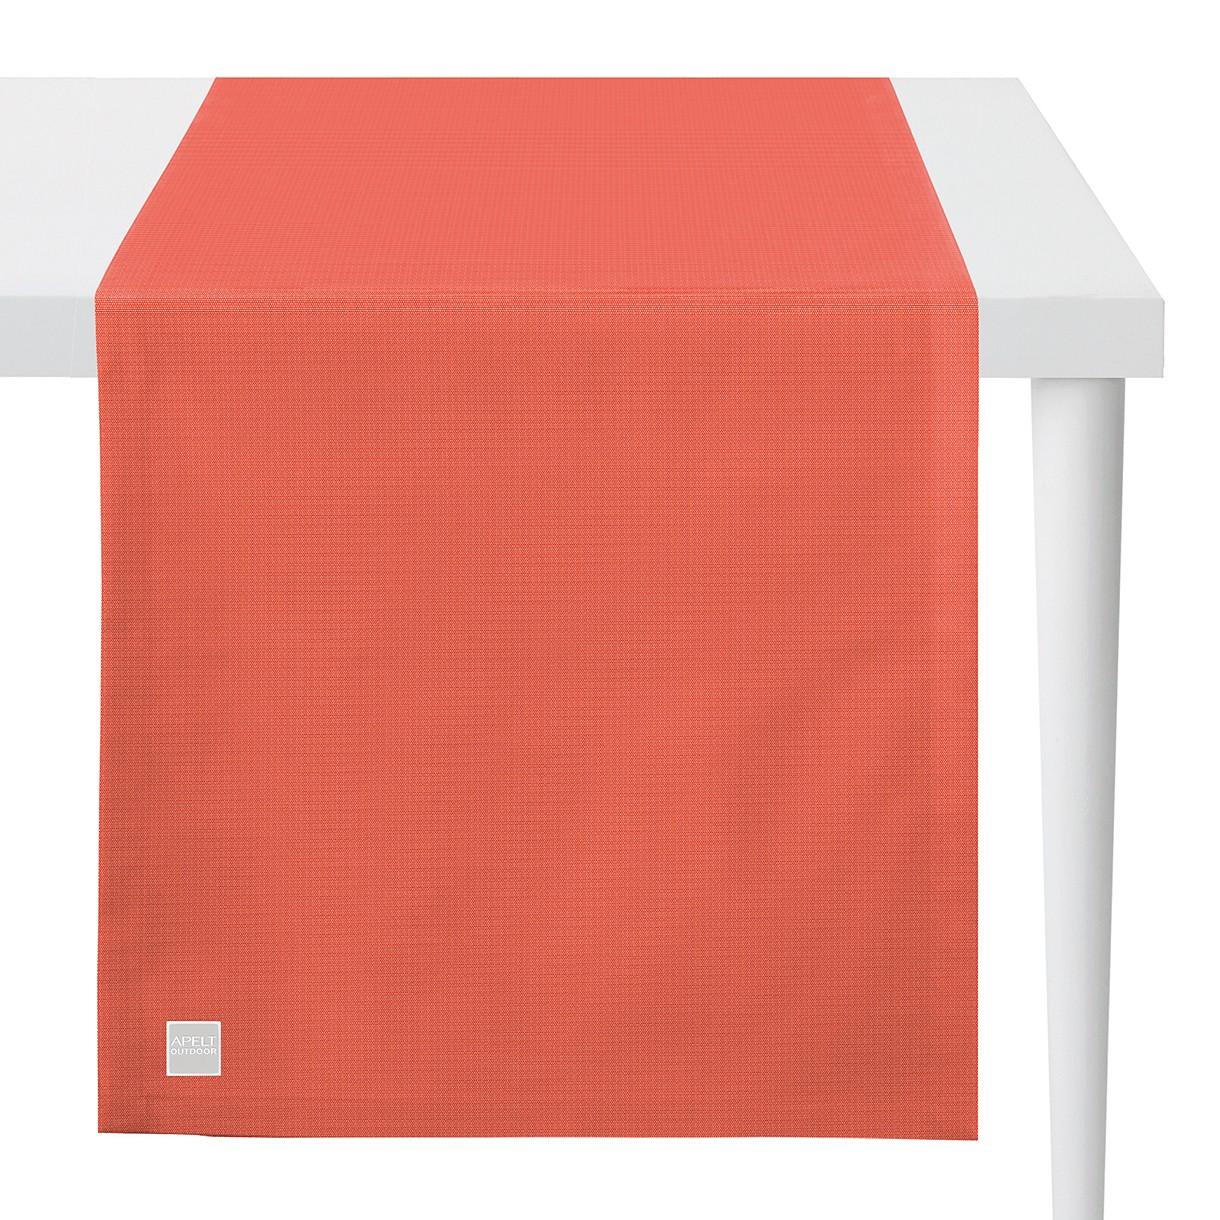 Apelt Tischläufer Gundaroo Koralle 46x140 cm (BxT) Kunstfaser